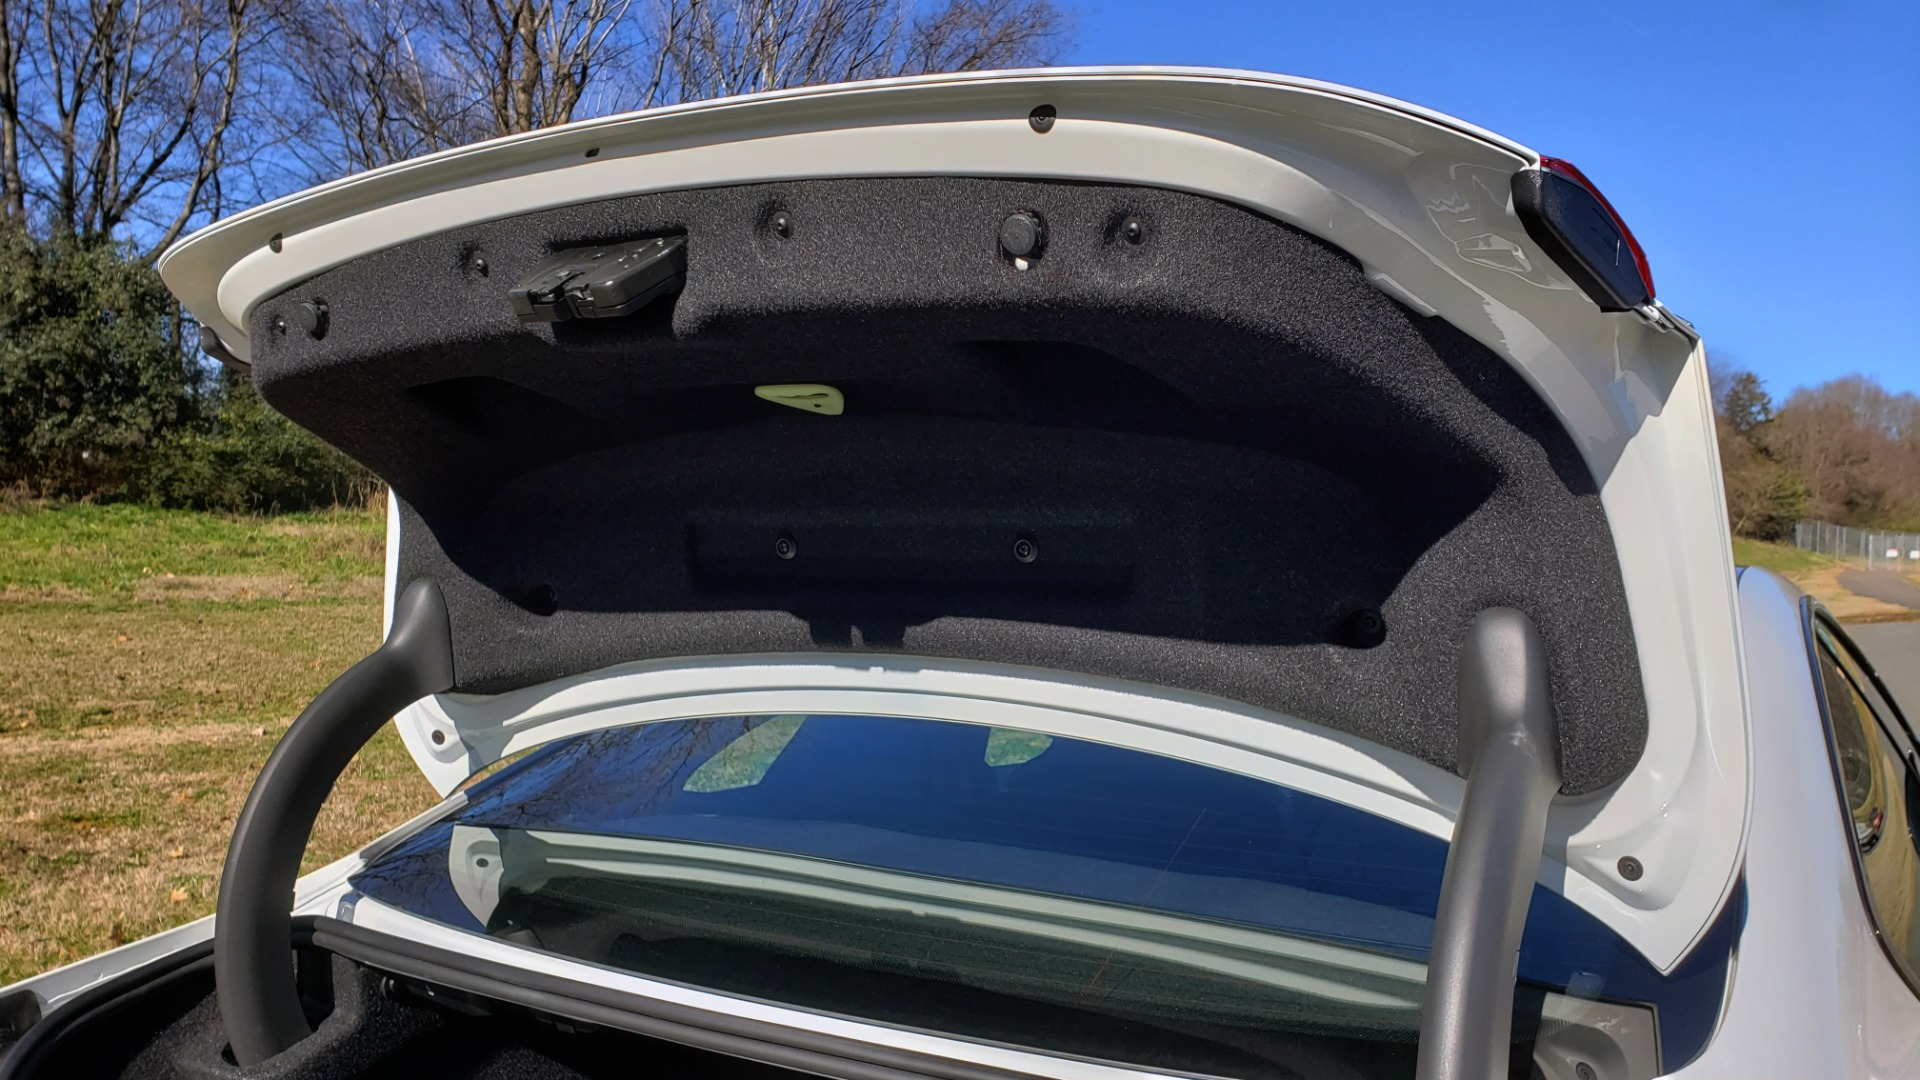 Used 2018 BMW M4 COMP PKG / EXEC / M-DRIVER / PARK CNTRL / ACTIVE BLIND SPOT for sale Sold at Formula Imports in Charlotte NC 28227 25